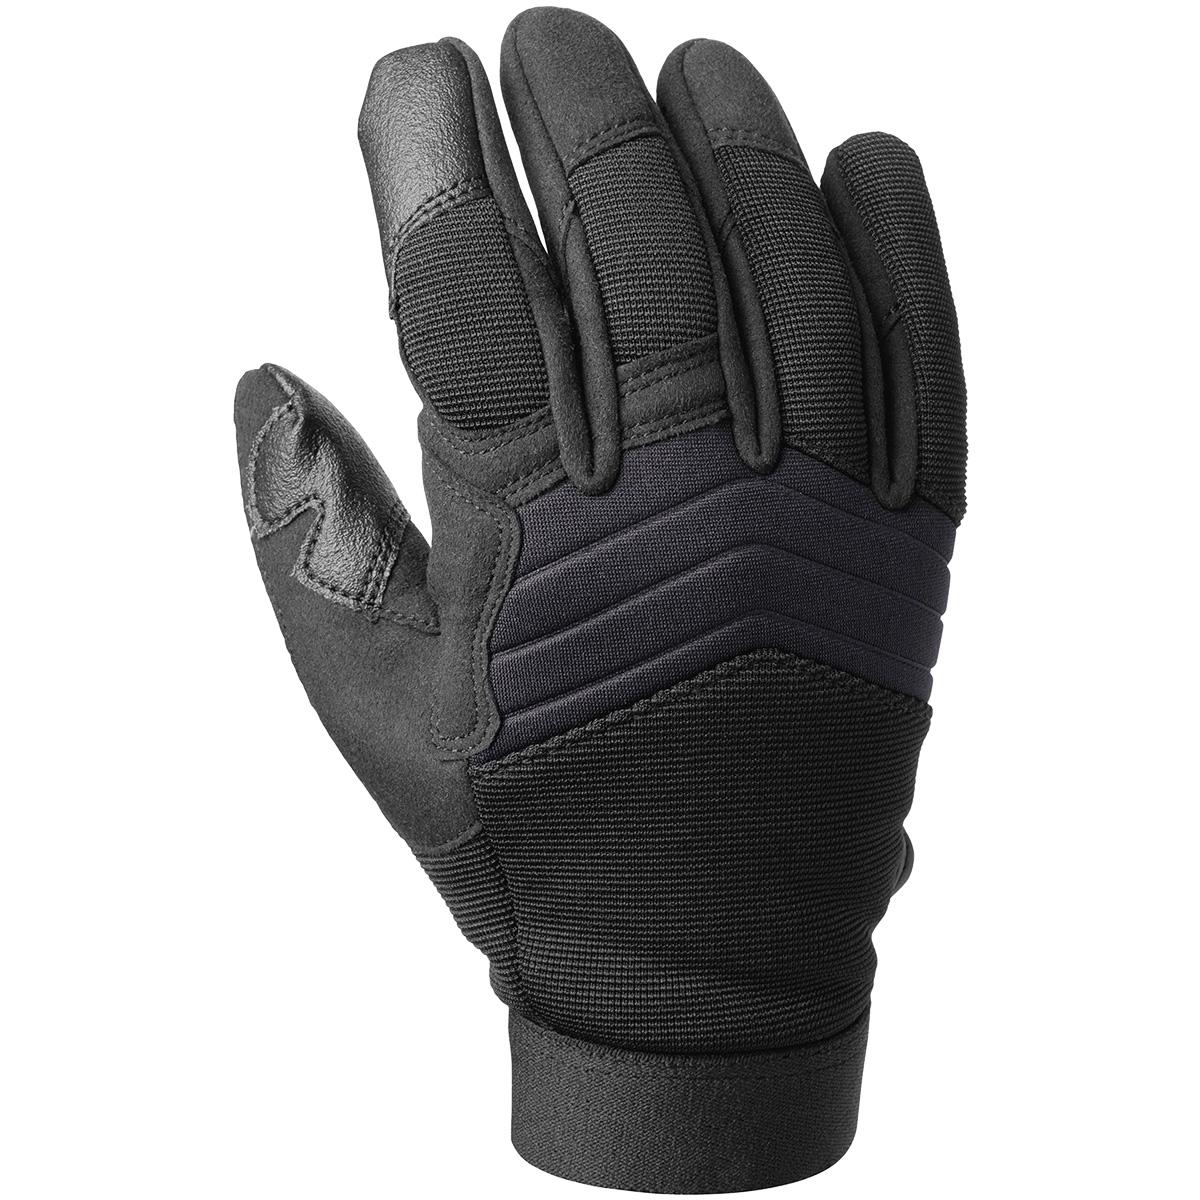 Black tactical gloves - Sentinel Helikon Special Operations Usm Tactical Gloves Combat Us Model Police Army Black